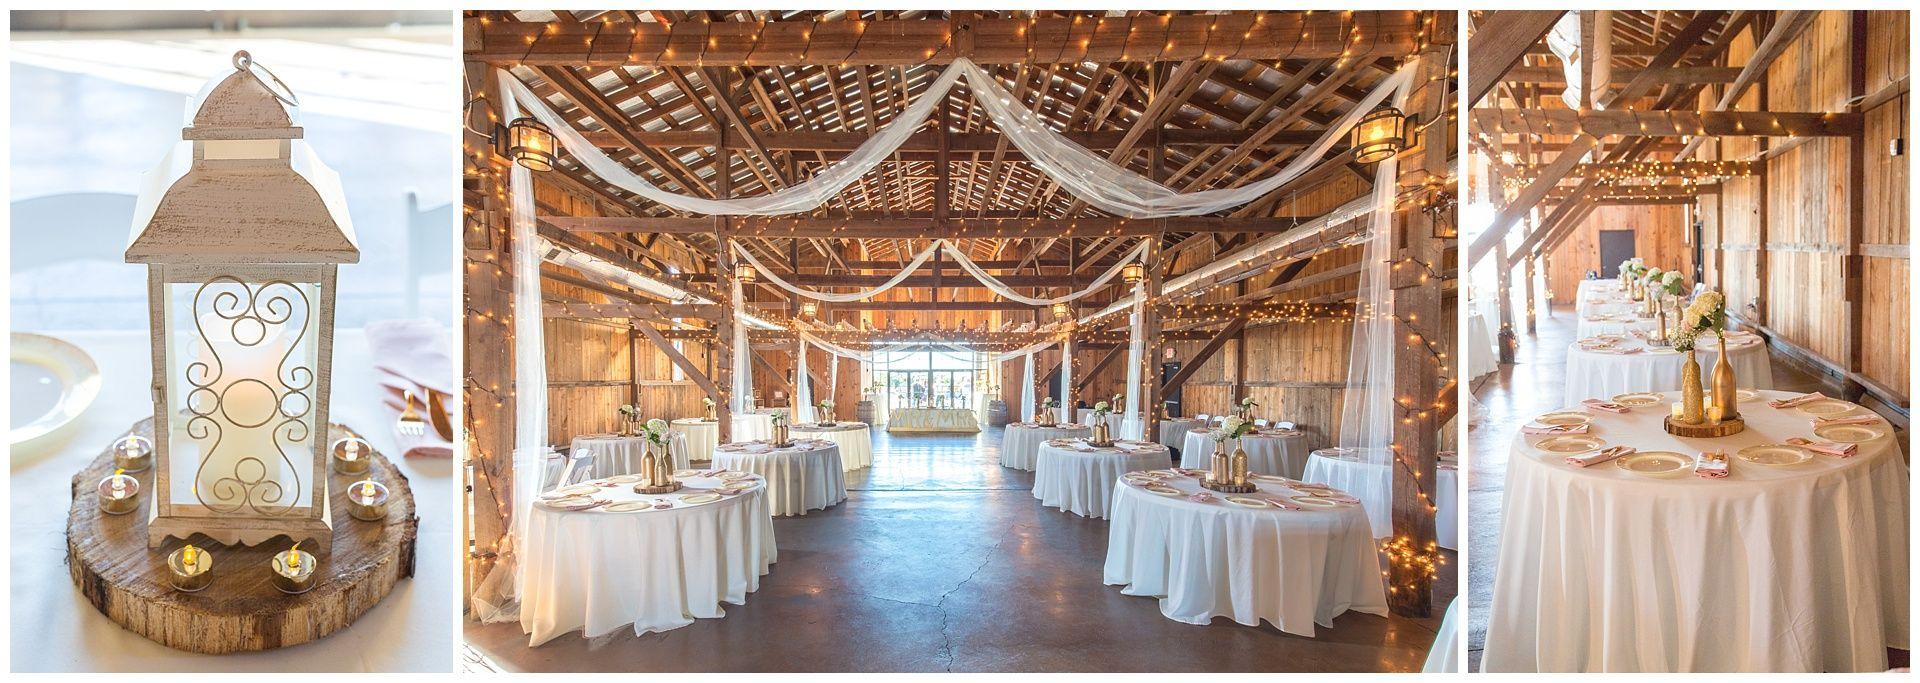 Wedding Reception Detail Photos At Talon Winery In Lexington Kentucky Southern